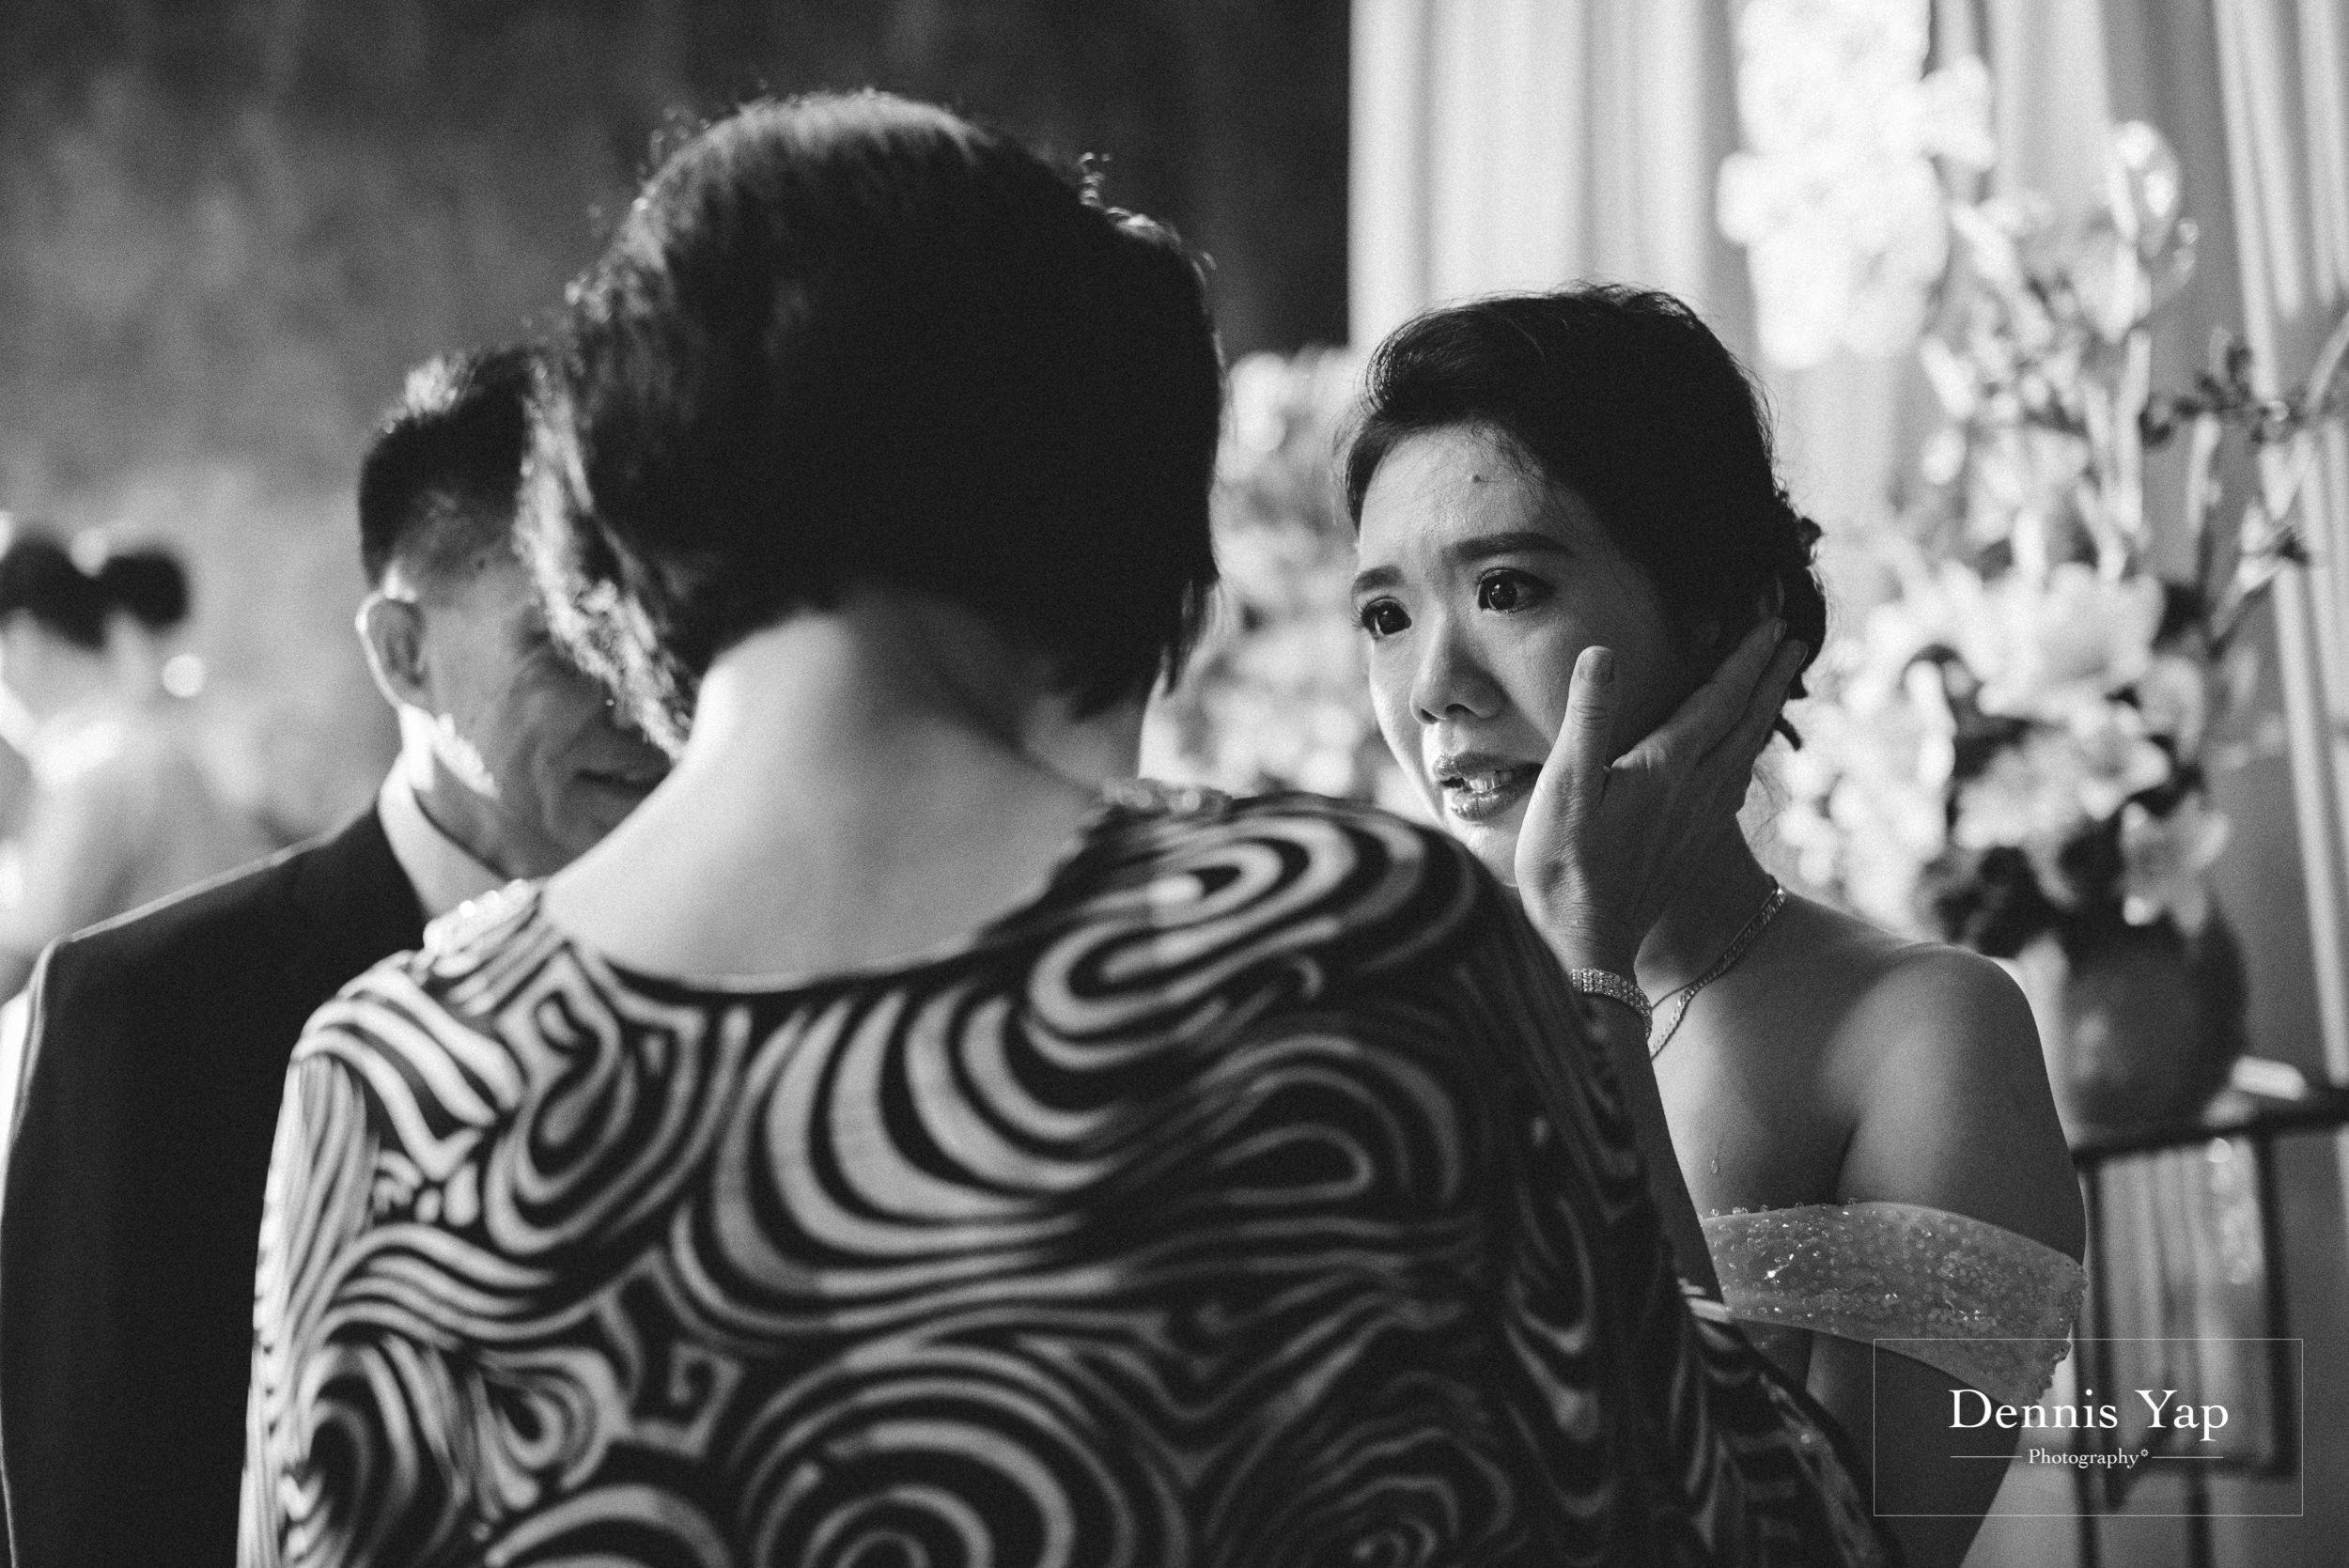 vincent peggy wedding dinner neo tamarind kuala lumpur dennis yap photography-15.jpg